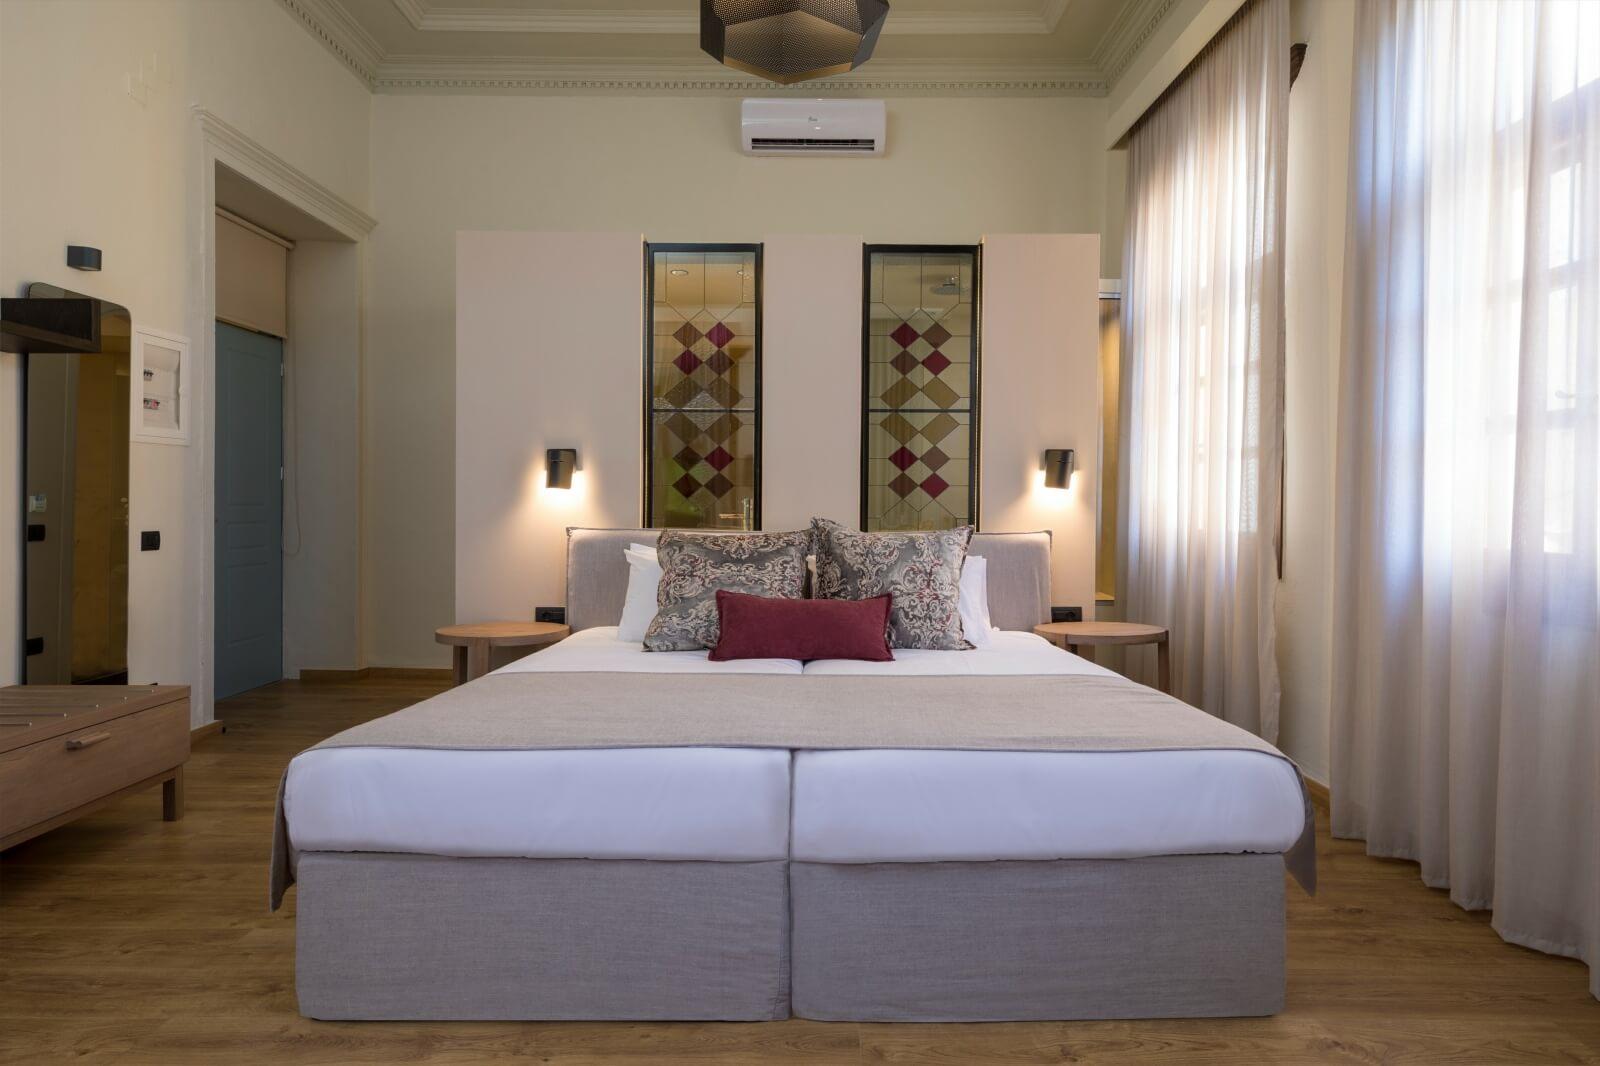 Contessa Boutique Hotel - Double Superior rooms